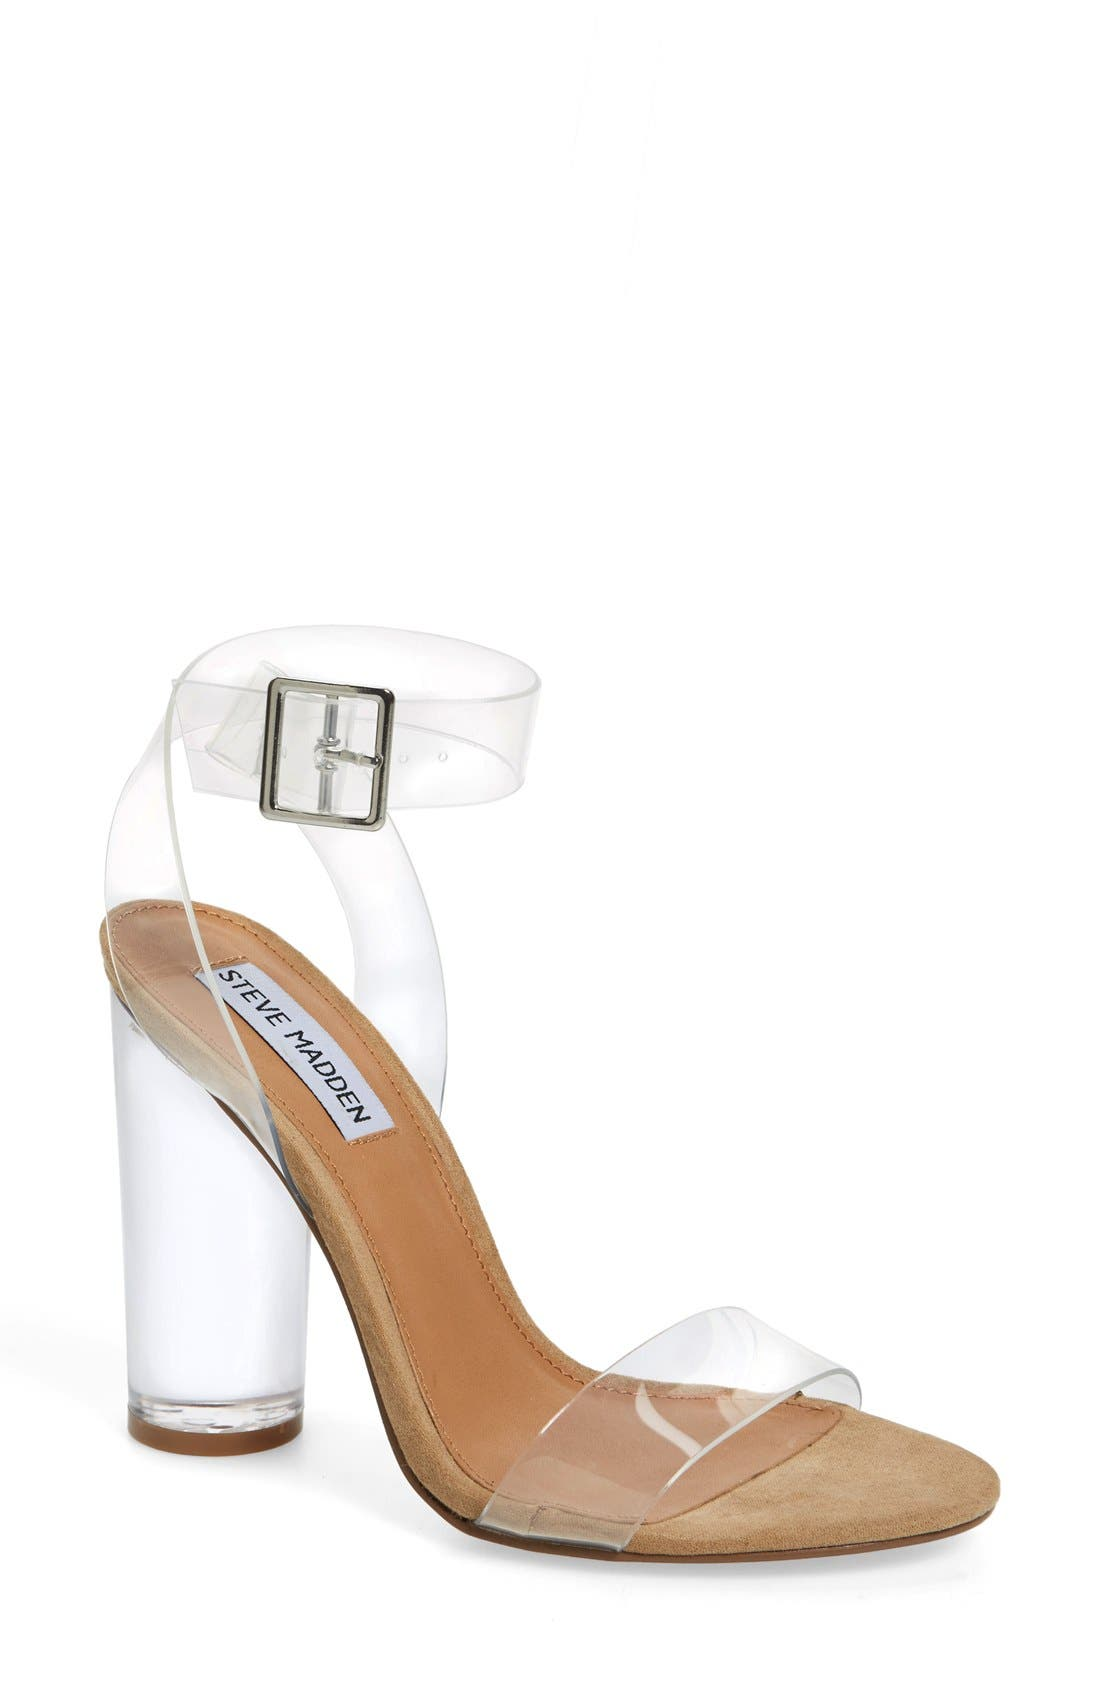 Clearer Column Heel Sandal, Main, color, 960